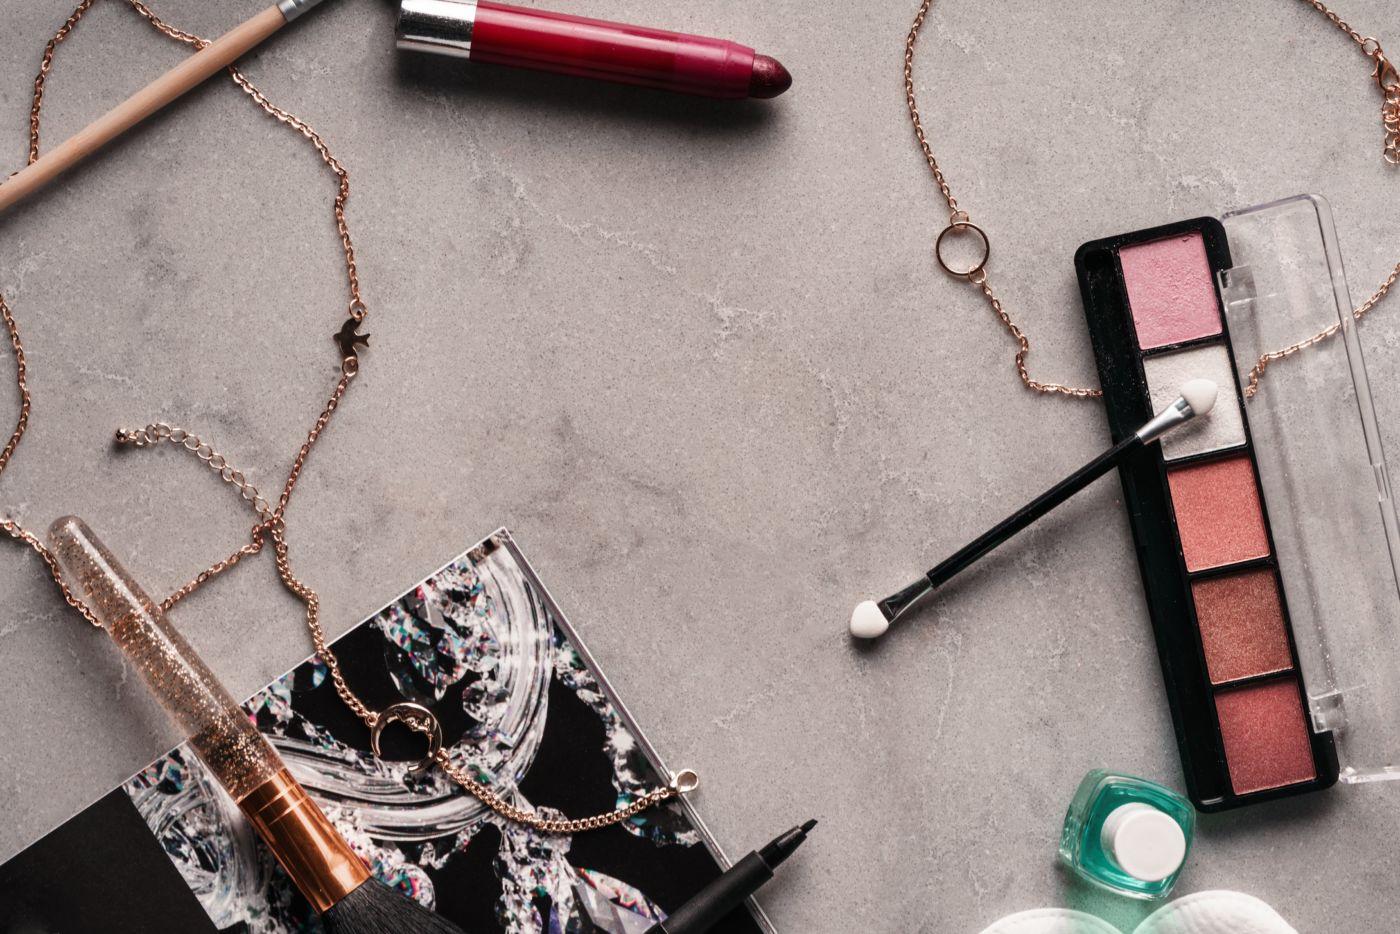 6 of the Best Luxury Beauty Brands on Amazon